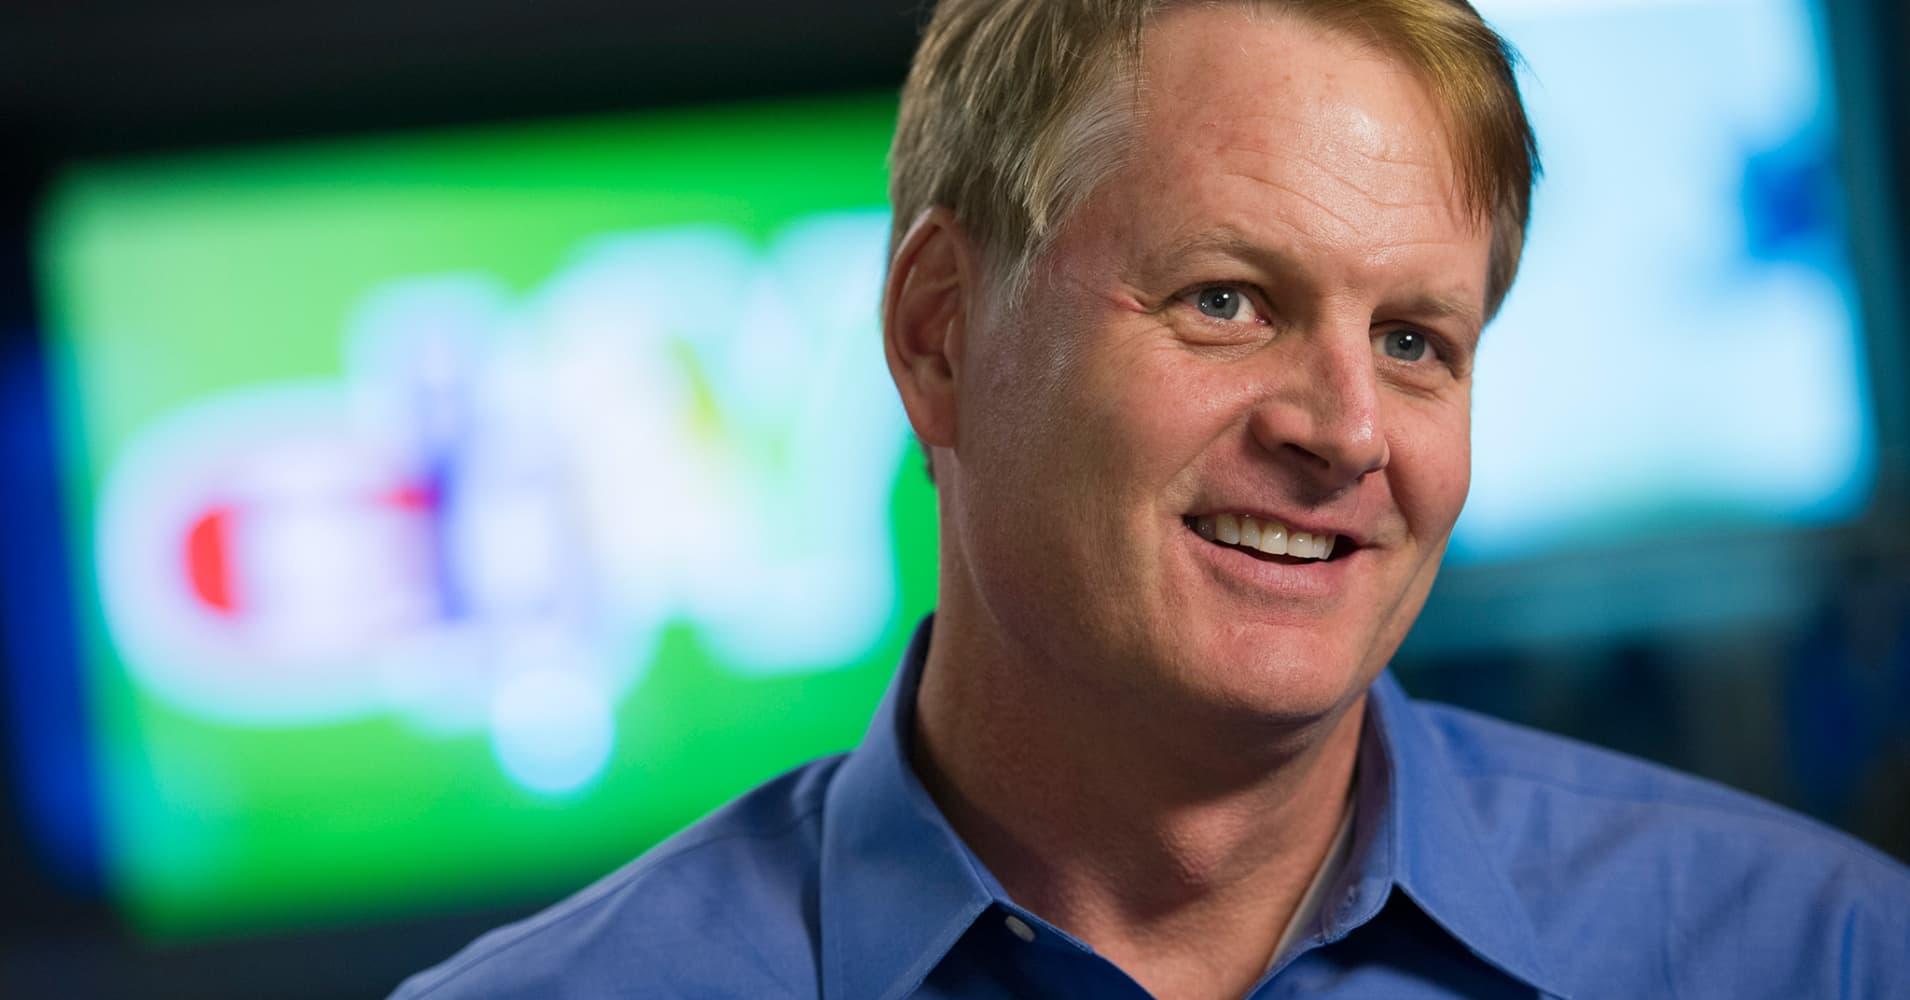 Former eBay boss John Donahoe named CEO of cloud company ServiceNow